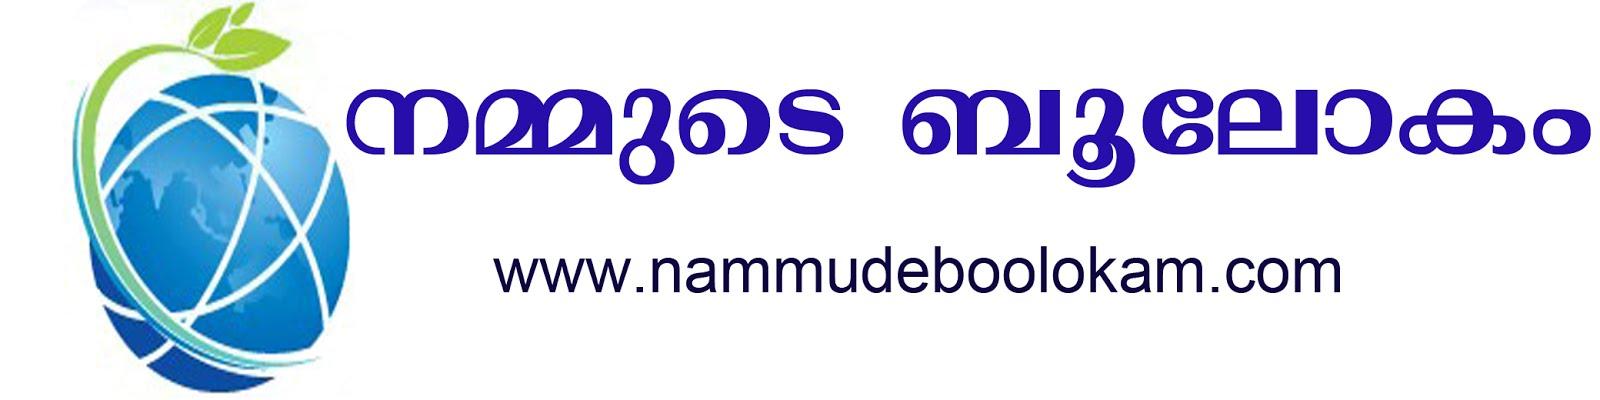 NAMMUDE BOOLOKAM